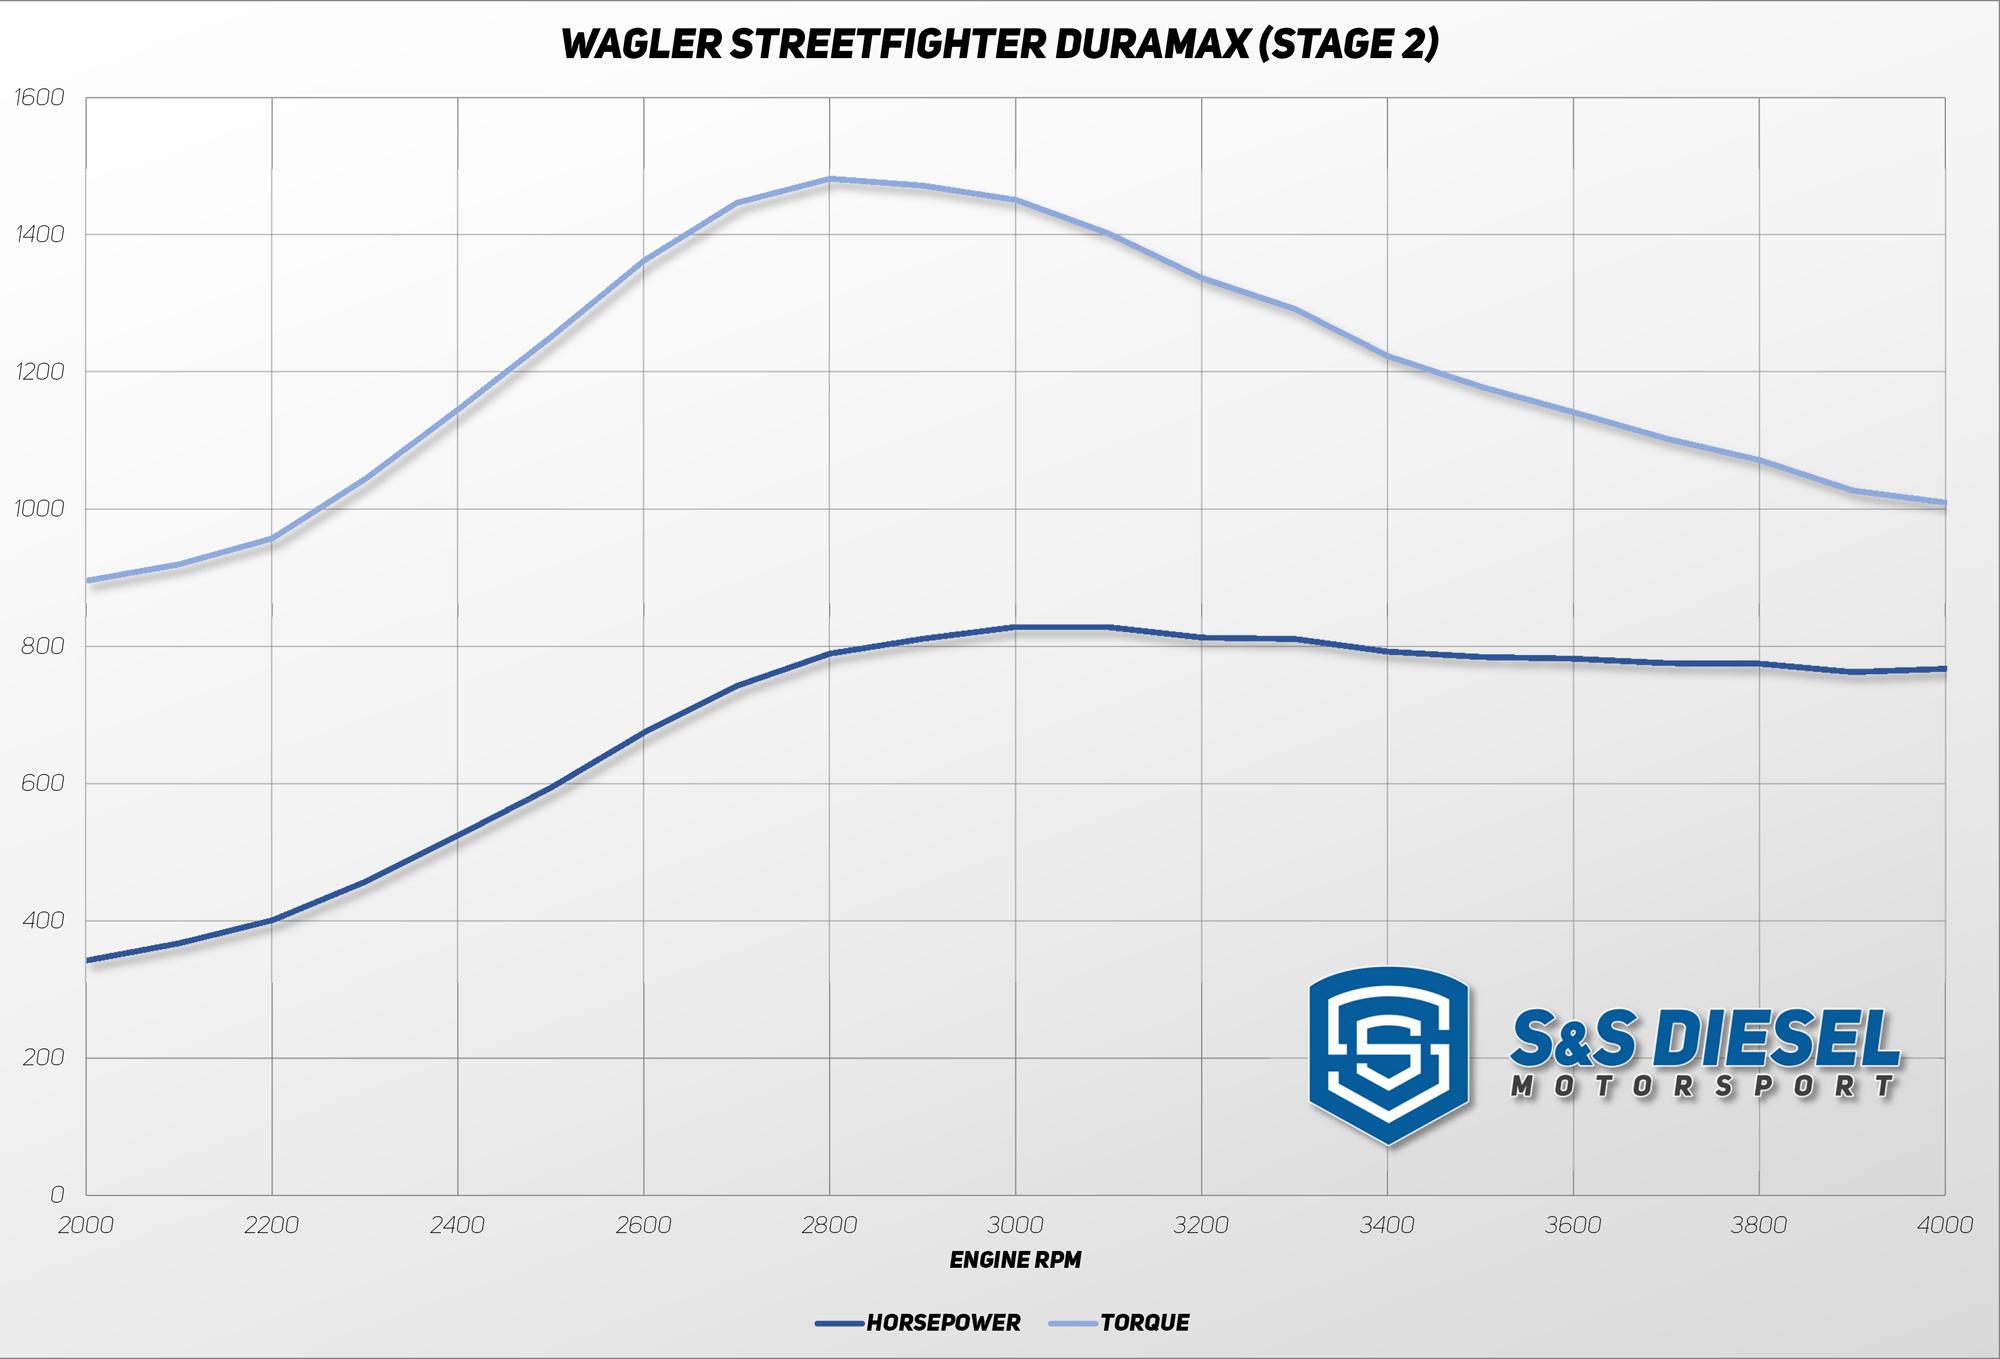 hight resolution of wagler streetfighter duramax